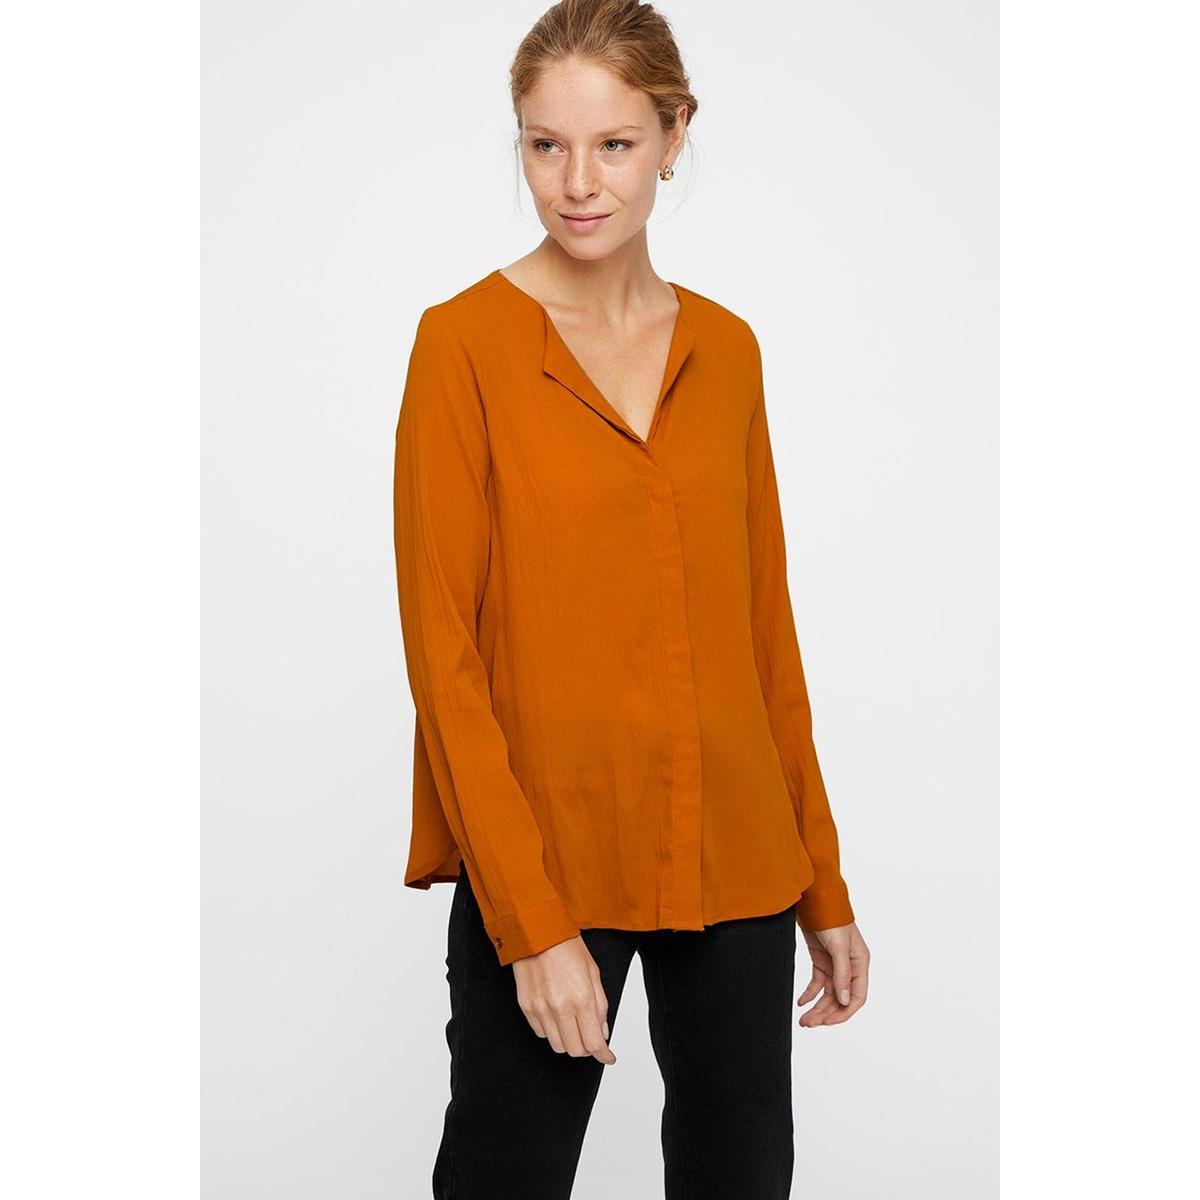 vmgrace l/s top exp 10211330 vero moda blouse cathay spice